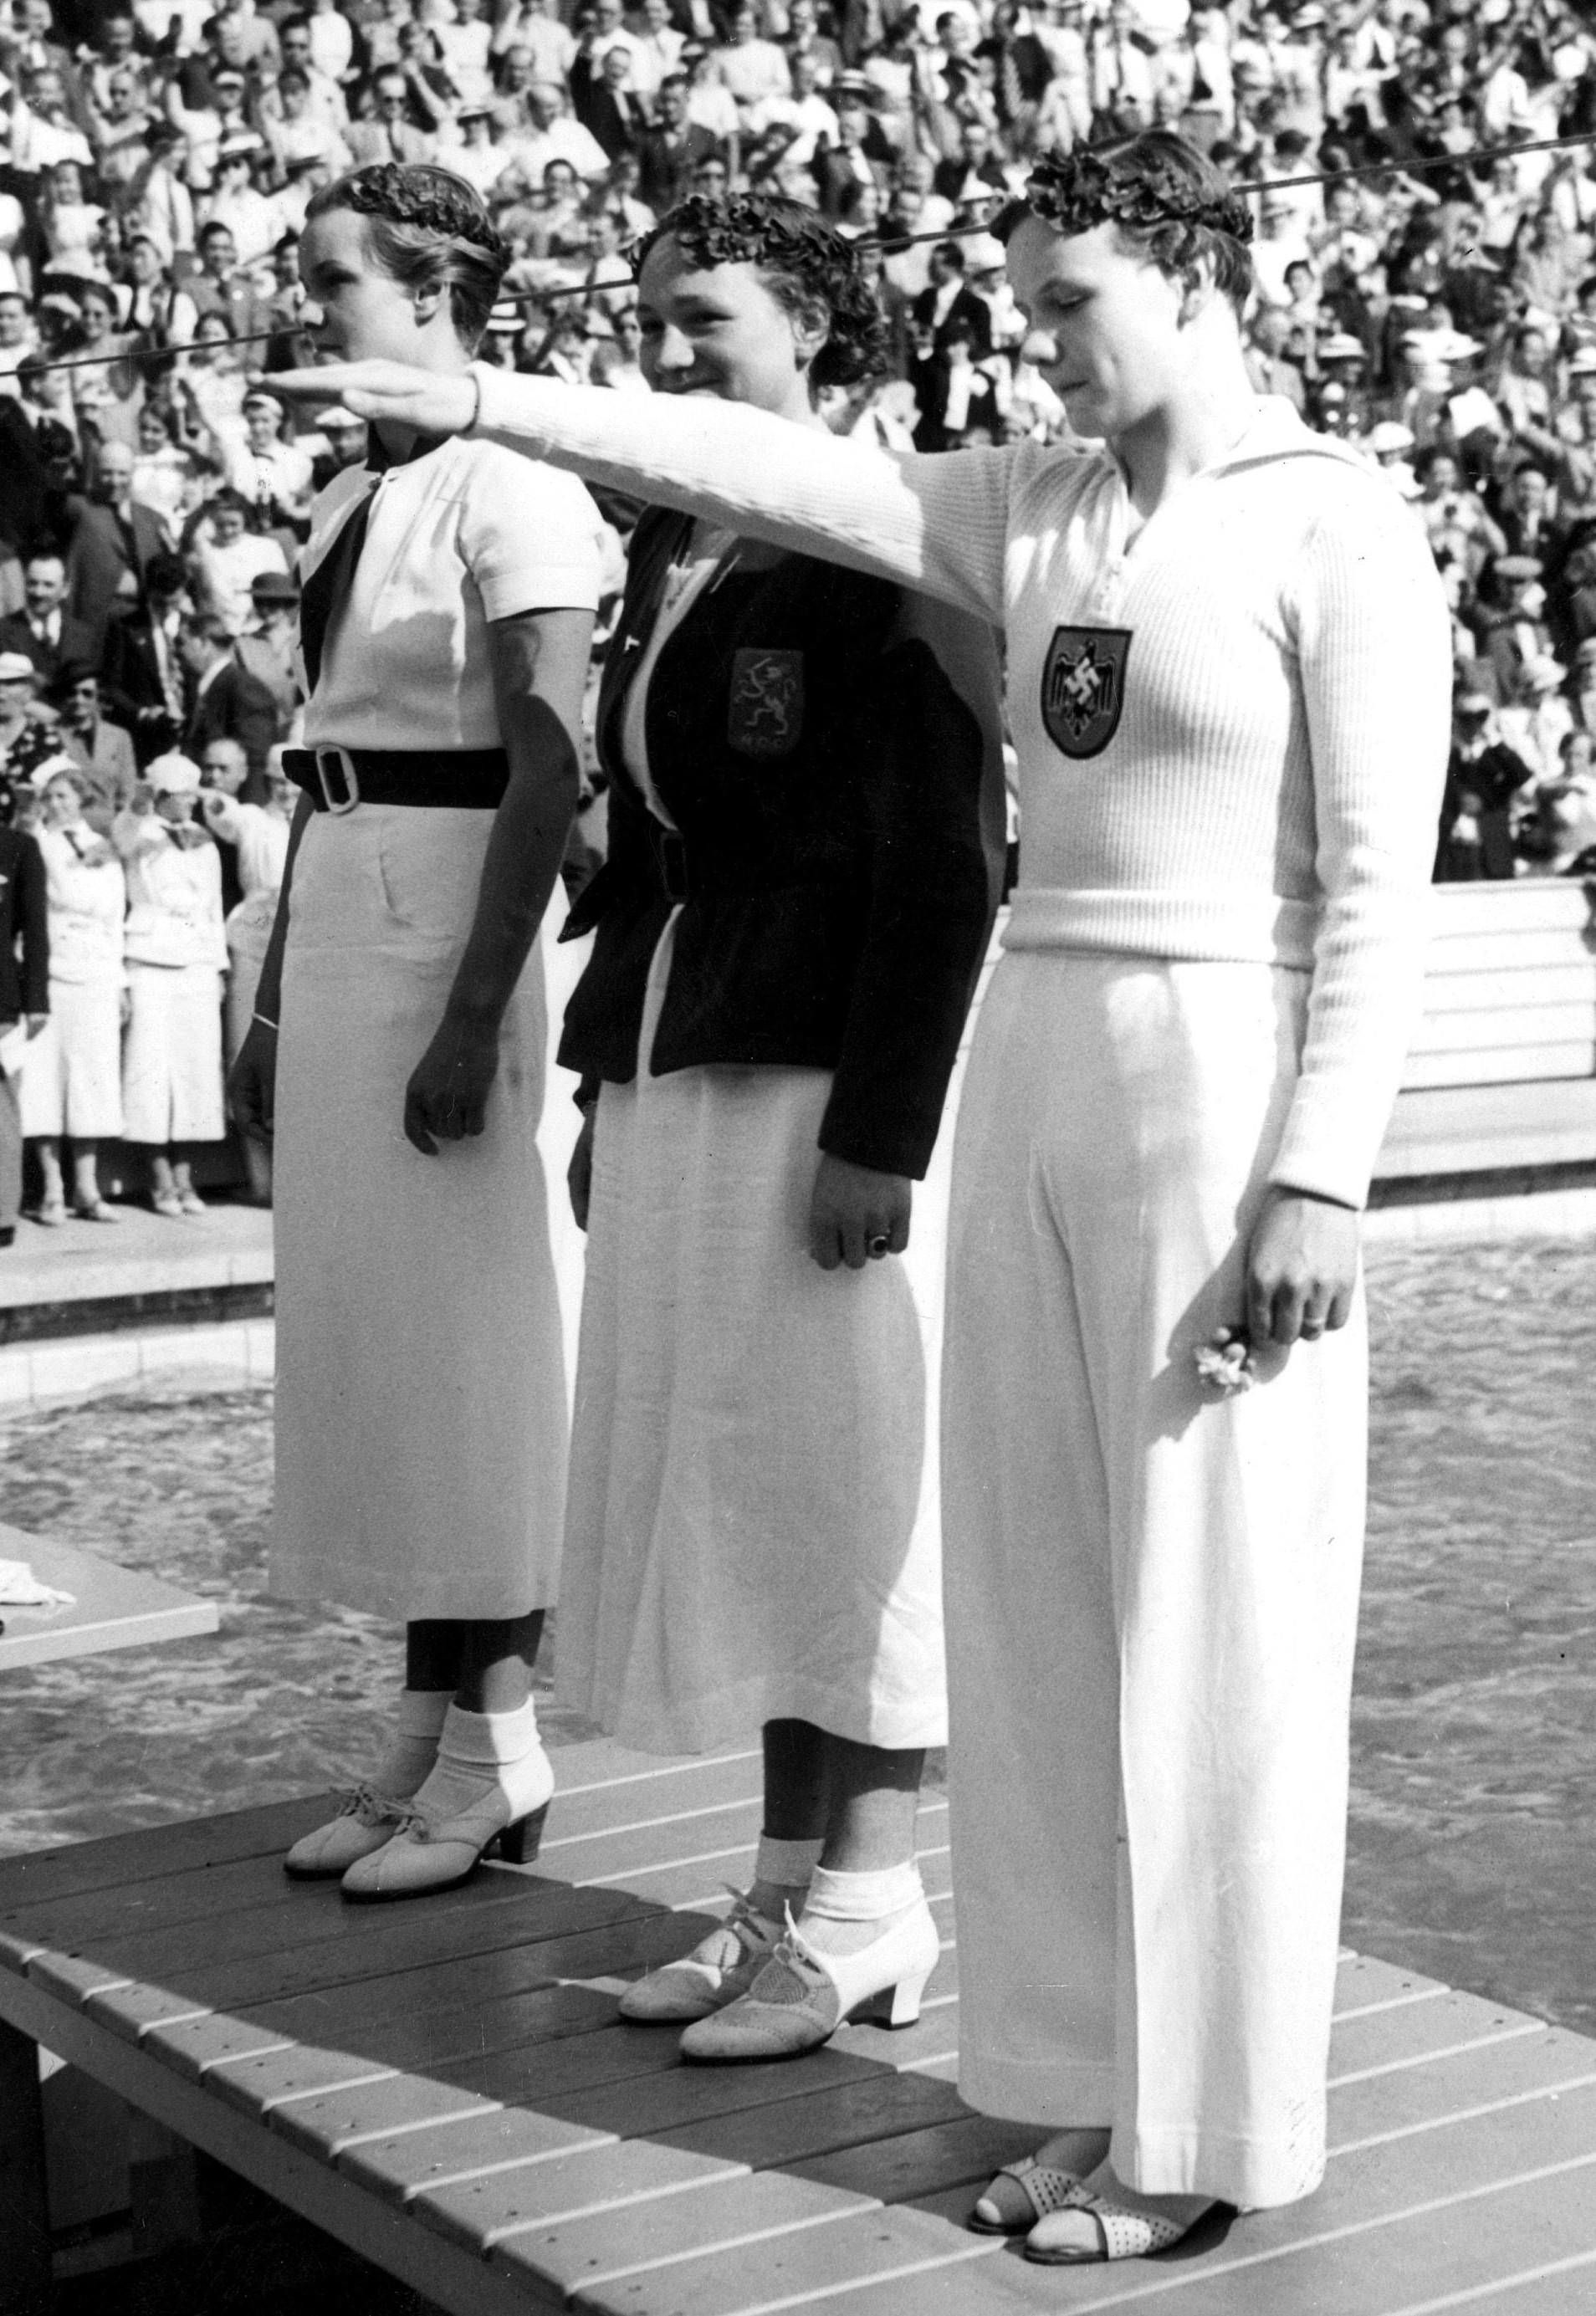 Jeannette Campbell, Rie Mastenbroek, Gisela Arendt em 1936 - (Foto: commons.wikimedia.org/Reprodução)